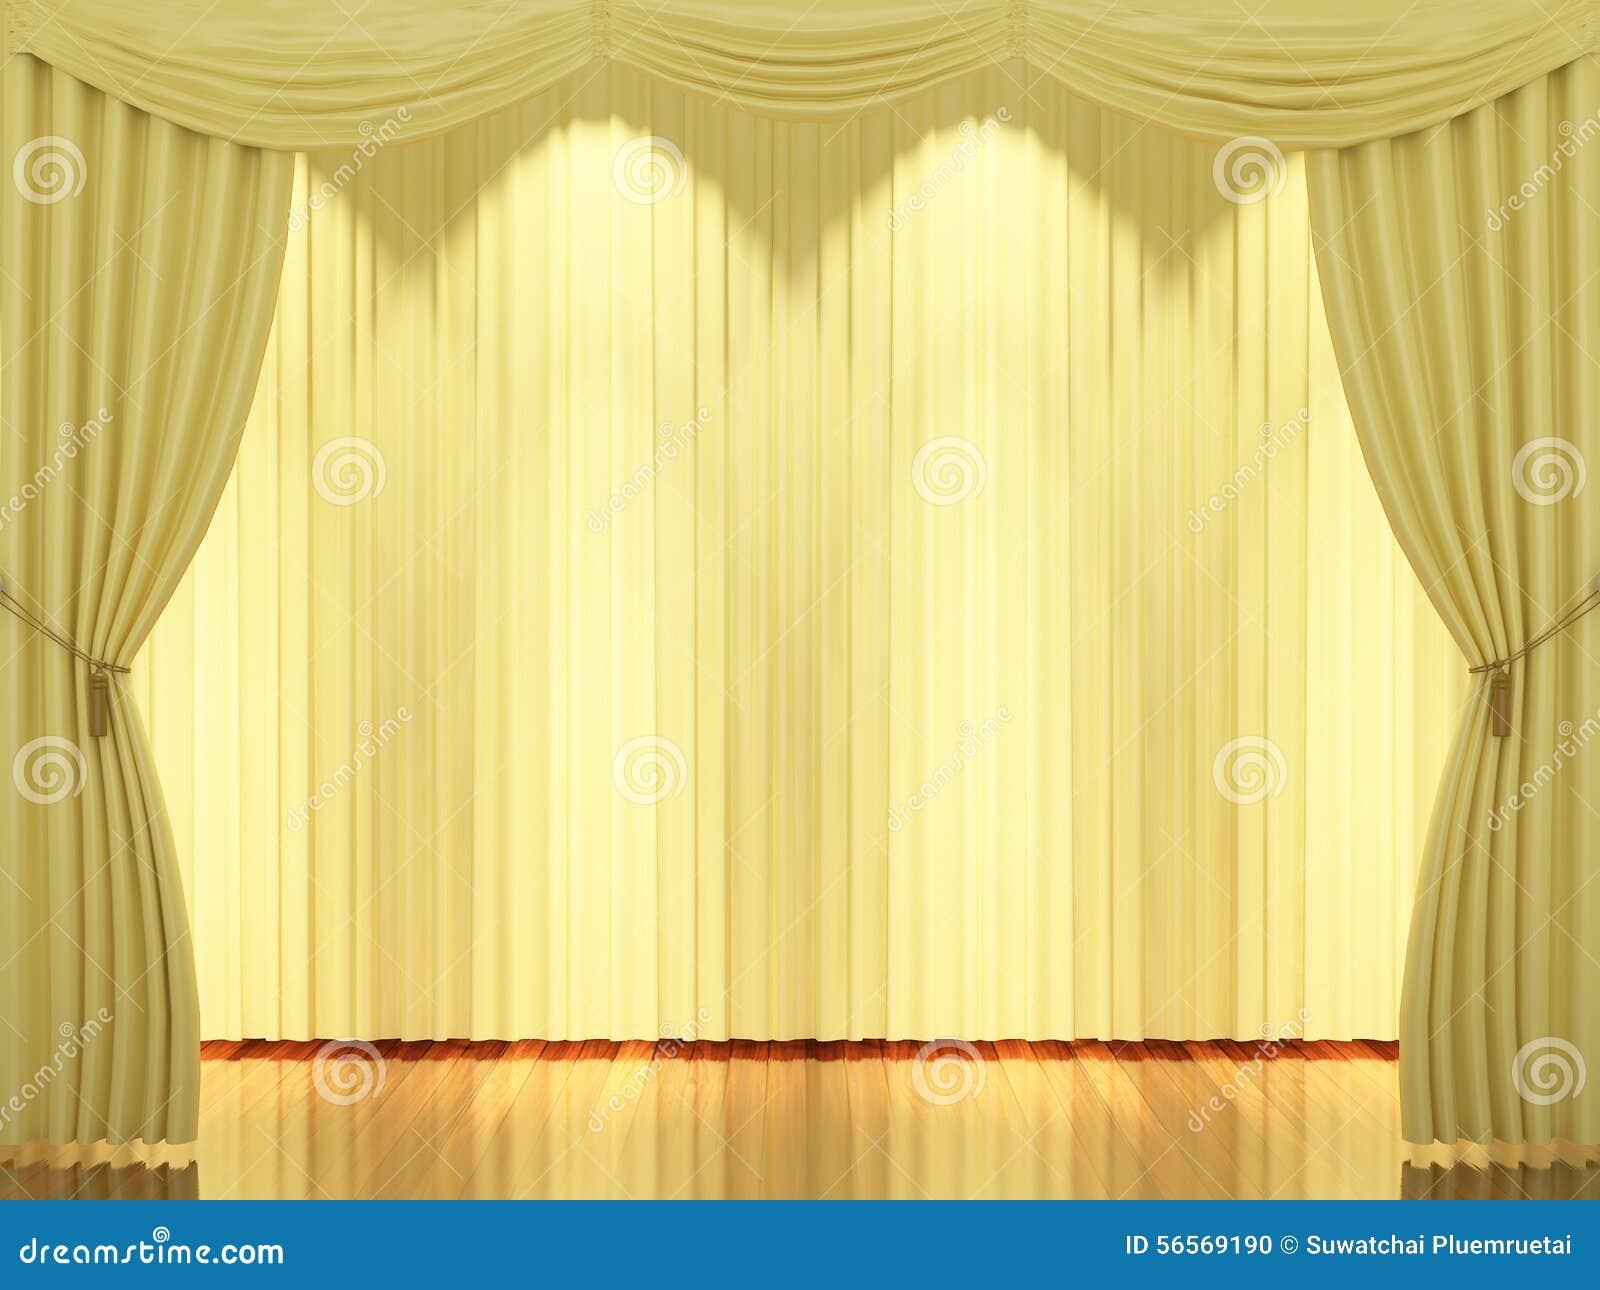 Download Στάδιο με τις κίτρινα κουρτίνες και το επίκεντρο Απεικόνιση αποθεμάτων - εικονογραφία από δημόσιος, ψυχαγωγία: 56569190